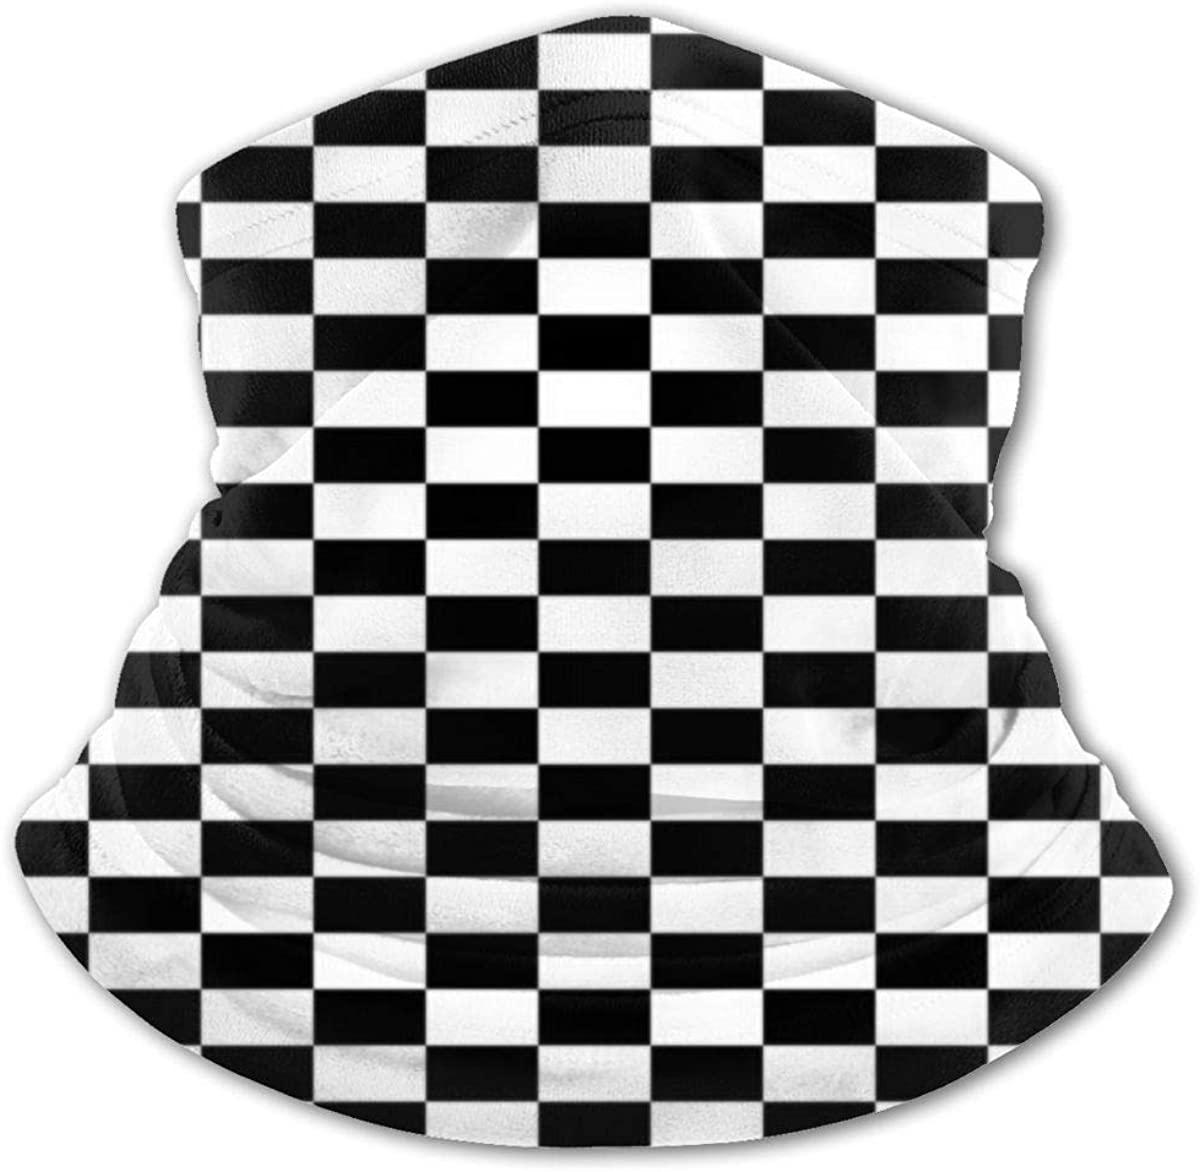 Chess Checkerboard Headwear For Girls And Boys, Head Wrap, Neck Gaiter, Headband, Tenn Fishing Mask, Magic Scarf, Tube Mask, Face Bandana Mask For Camping Running Cycling